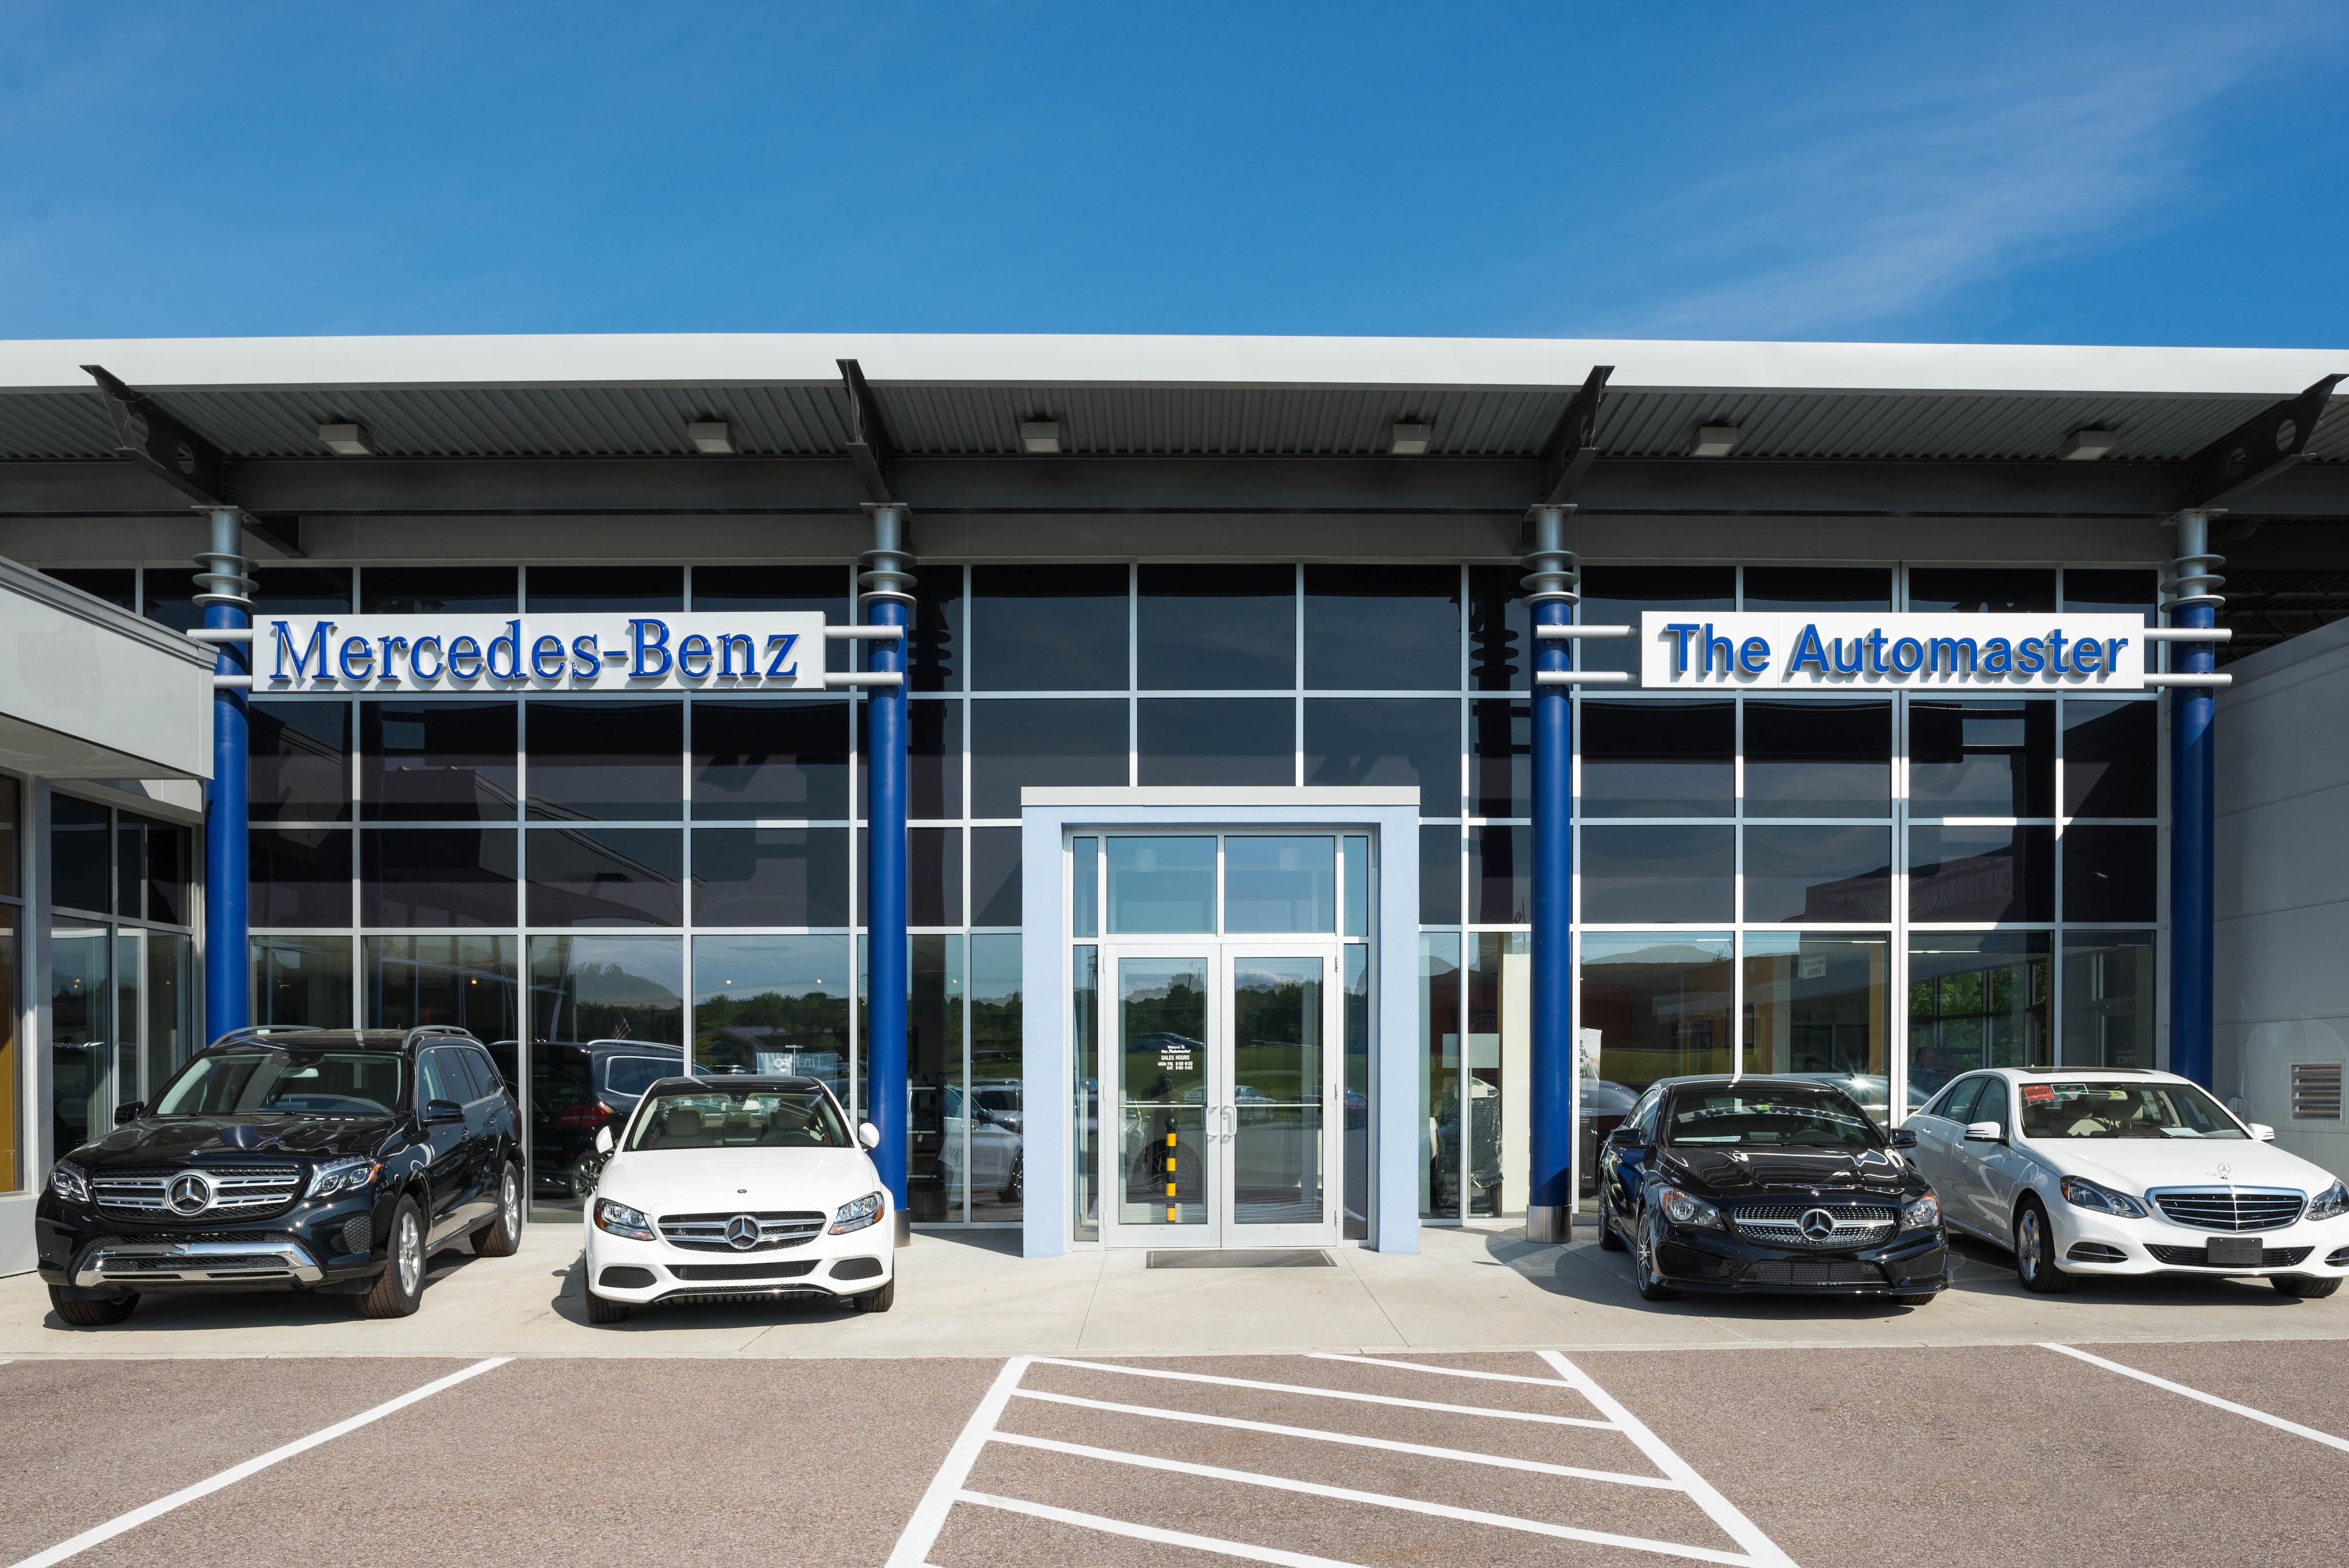 Superb Find Your Perfect Ride And More At Our Mercedes Benz Dealership Serving  Shelburne, Burlington VT, South Burlington VT, Plattsburgh NY, ...